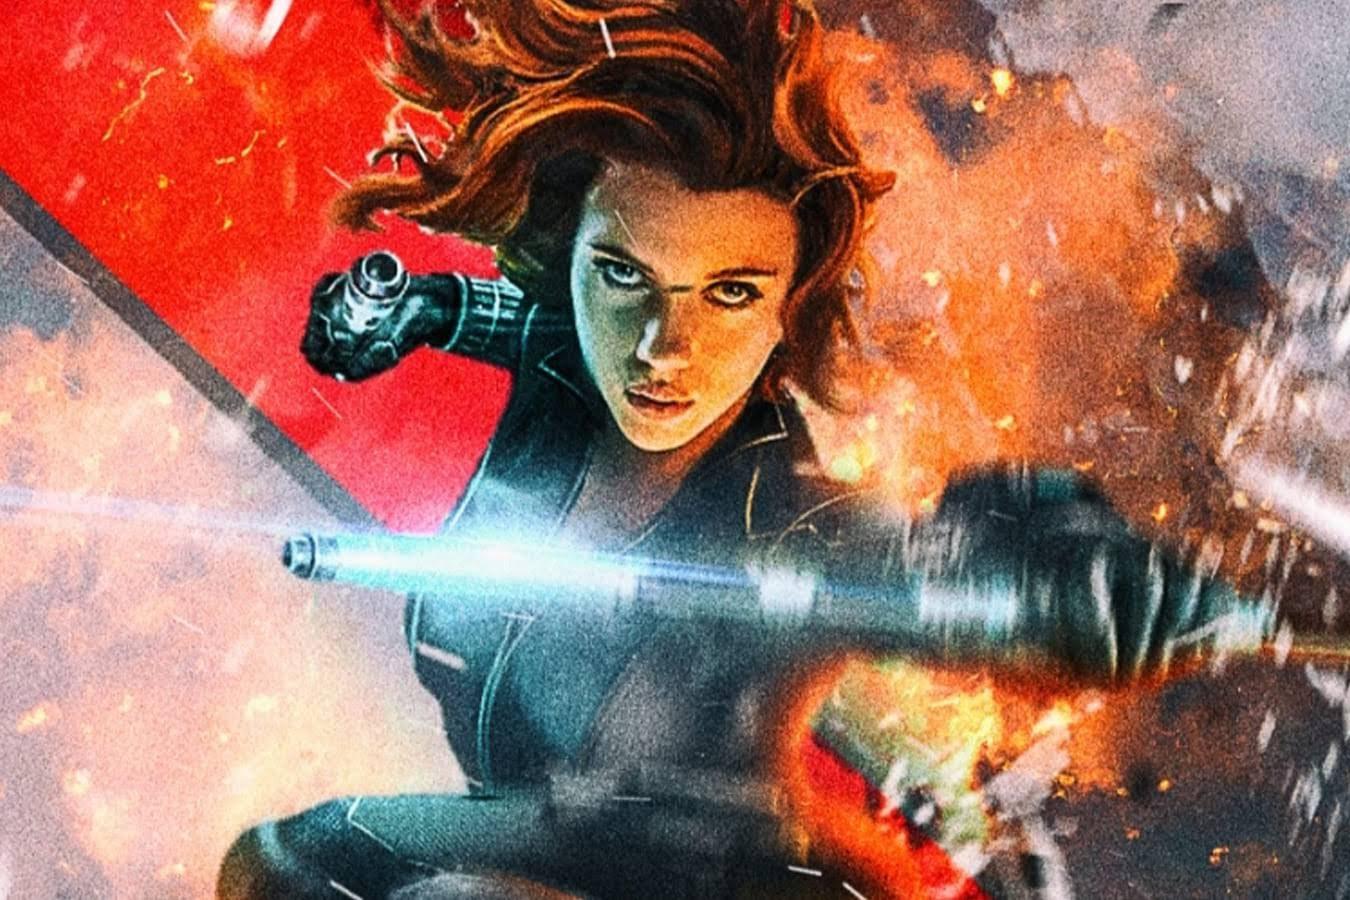 Black Widow : 全米公開は早くても、7月頃か ? ! の期待が寄せられるマーベルのスピンオフ映画「ブラック・ウィドウ」のスカーレット・ジョハンソンを描いたクールなファンメイドのポスター ! !